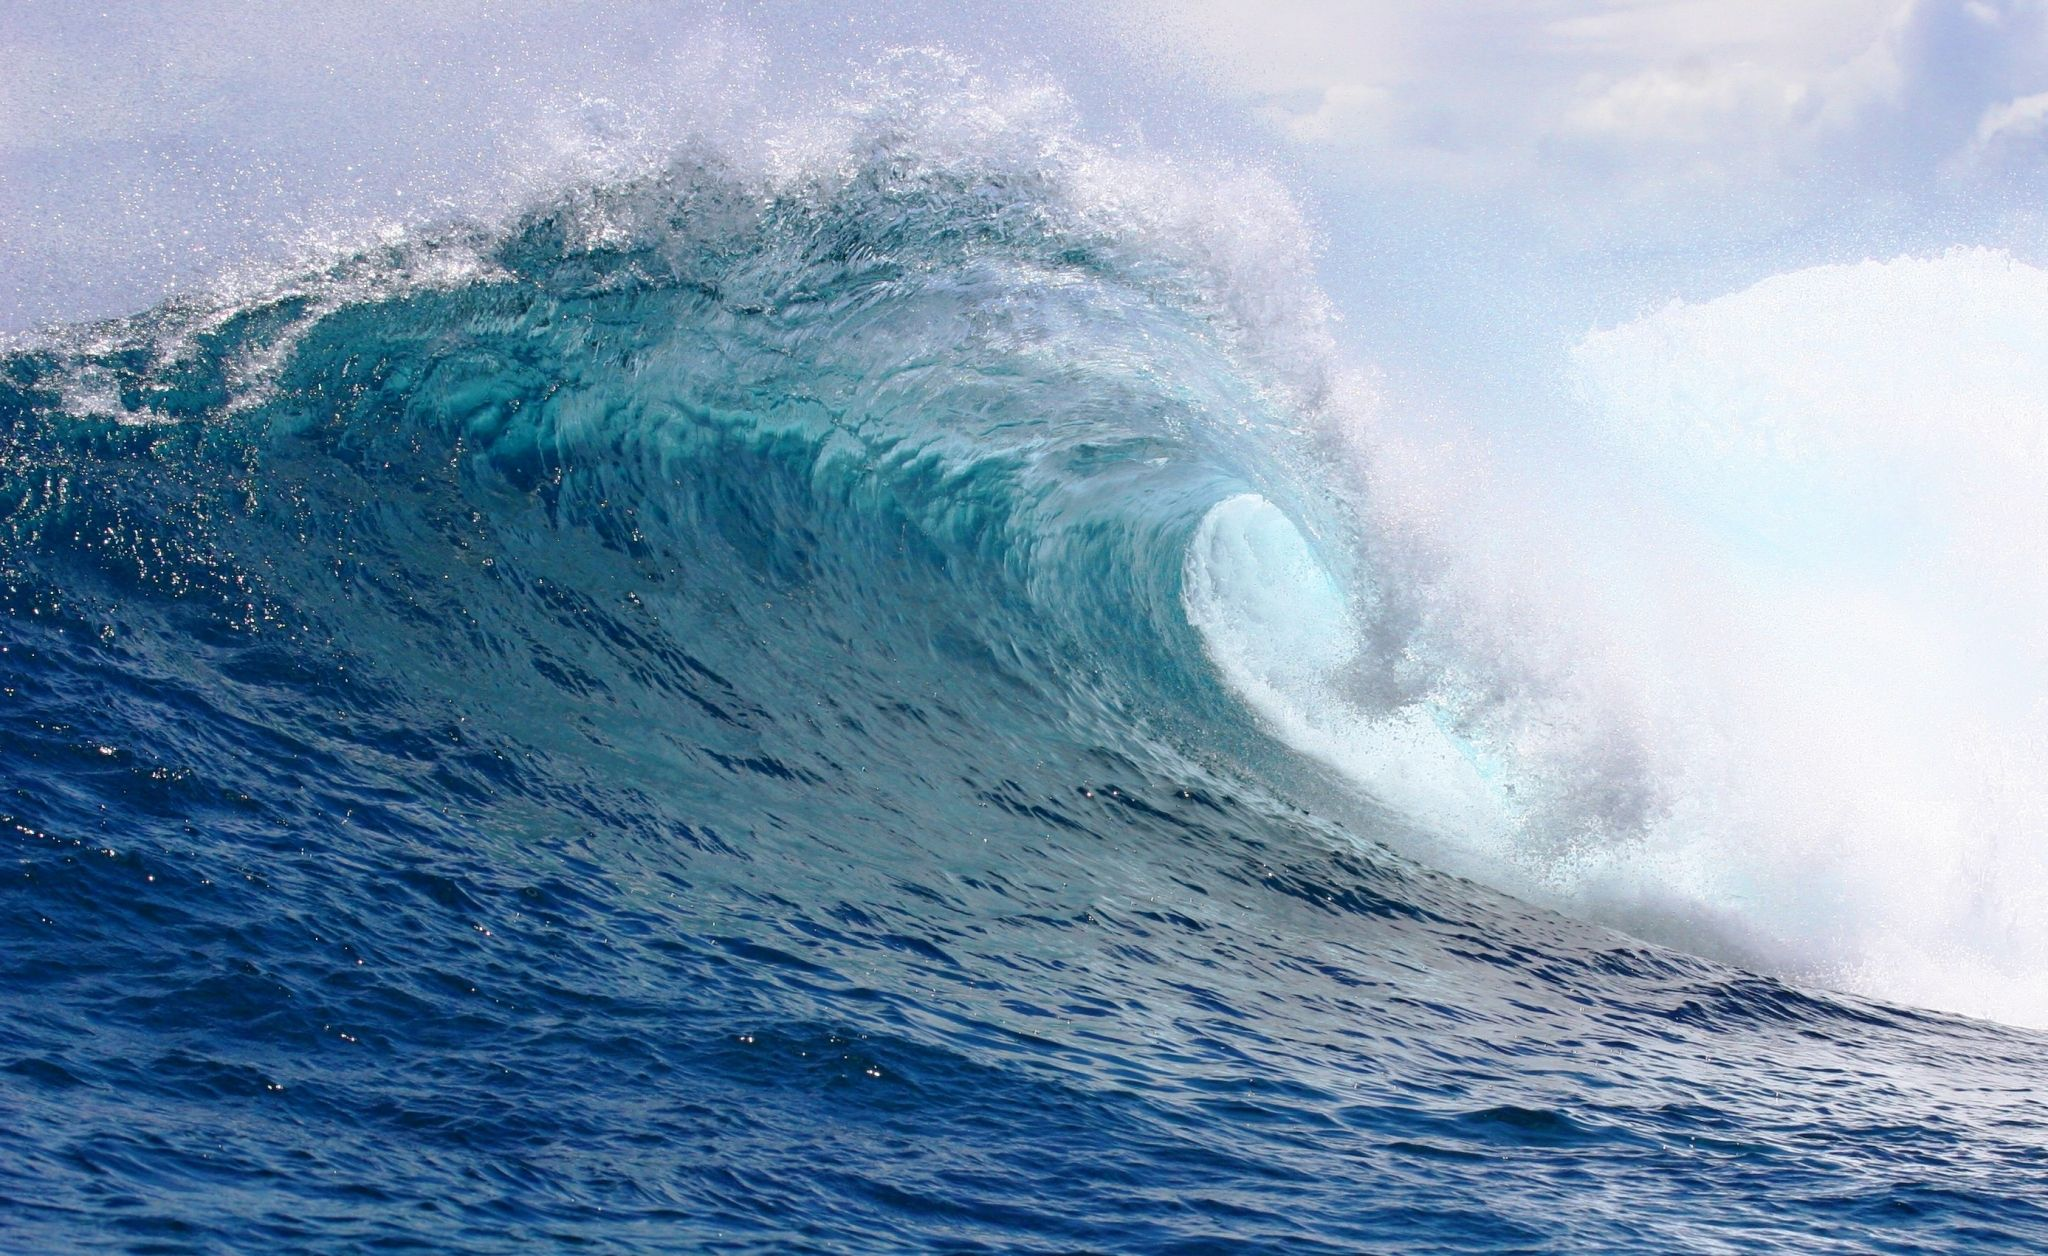 Water Hd Wallpapers 1080p High Quality Ololoshenka Ocean